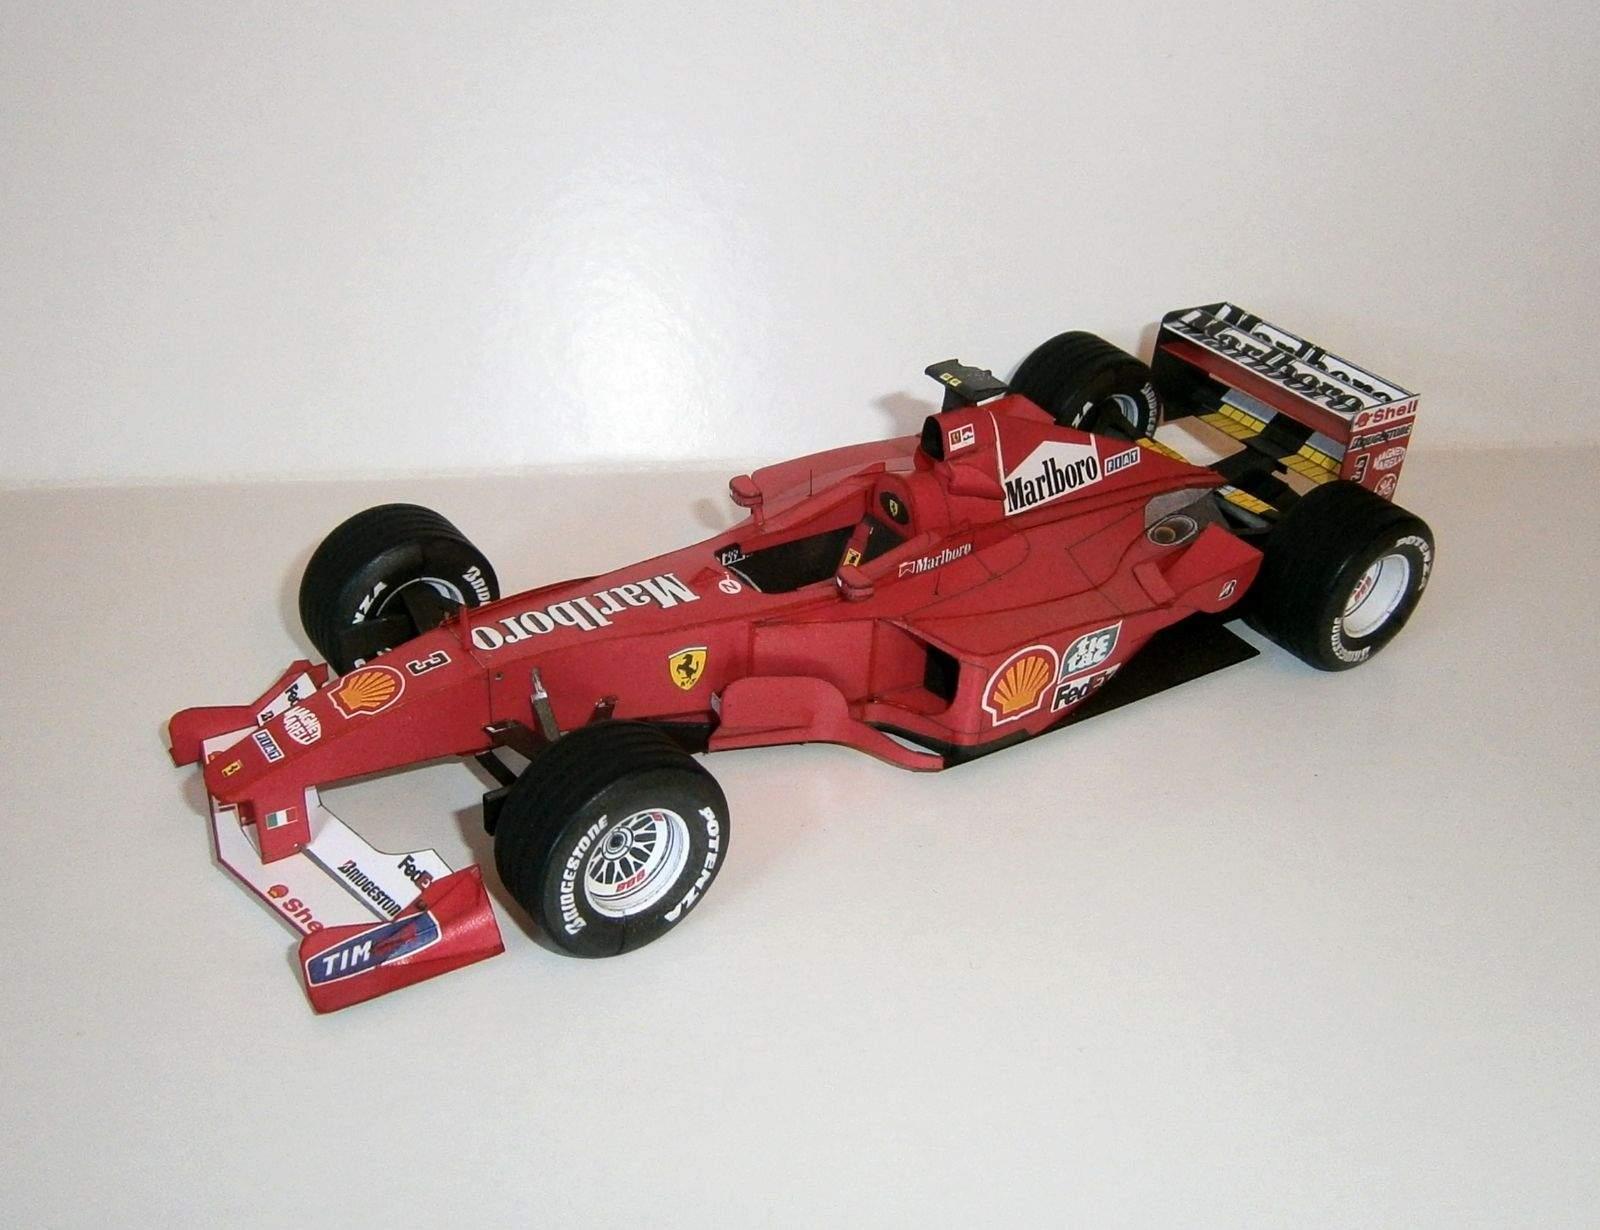 Ferrari F2000 - M.Schumacher 2000